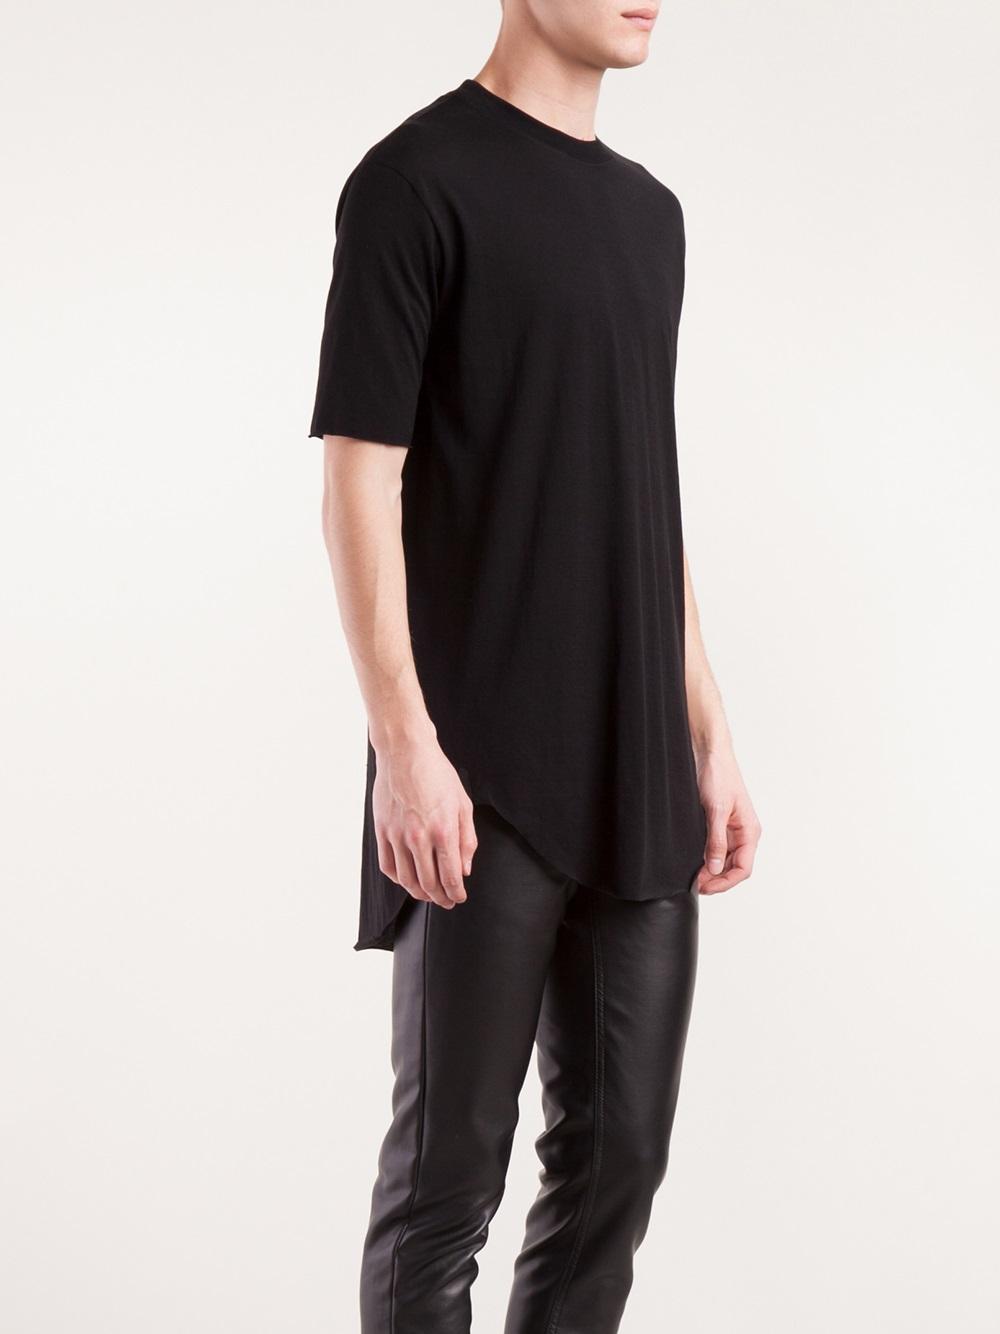 Wholesale Mens Plain Long Length T-shirts Raw Trimming ...